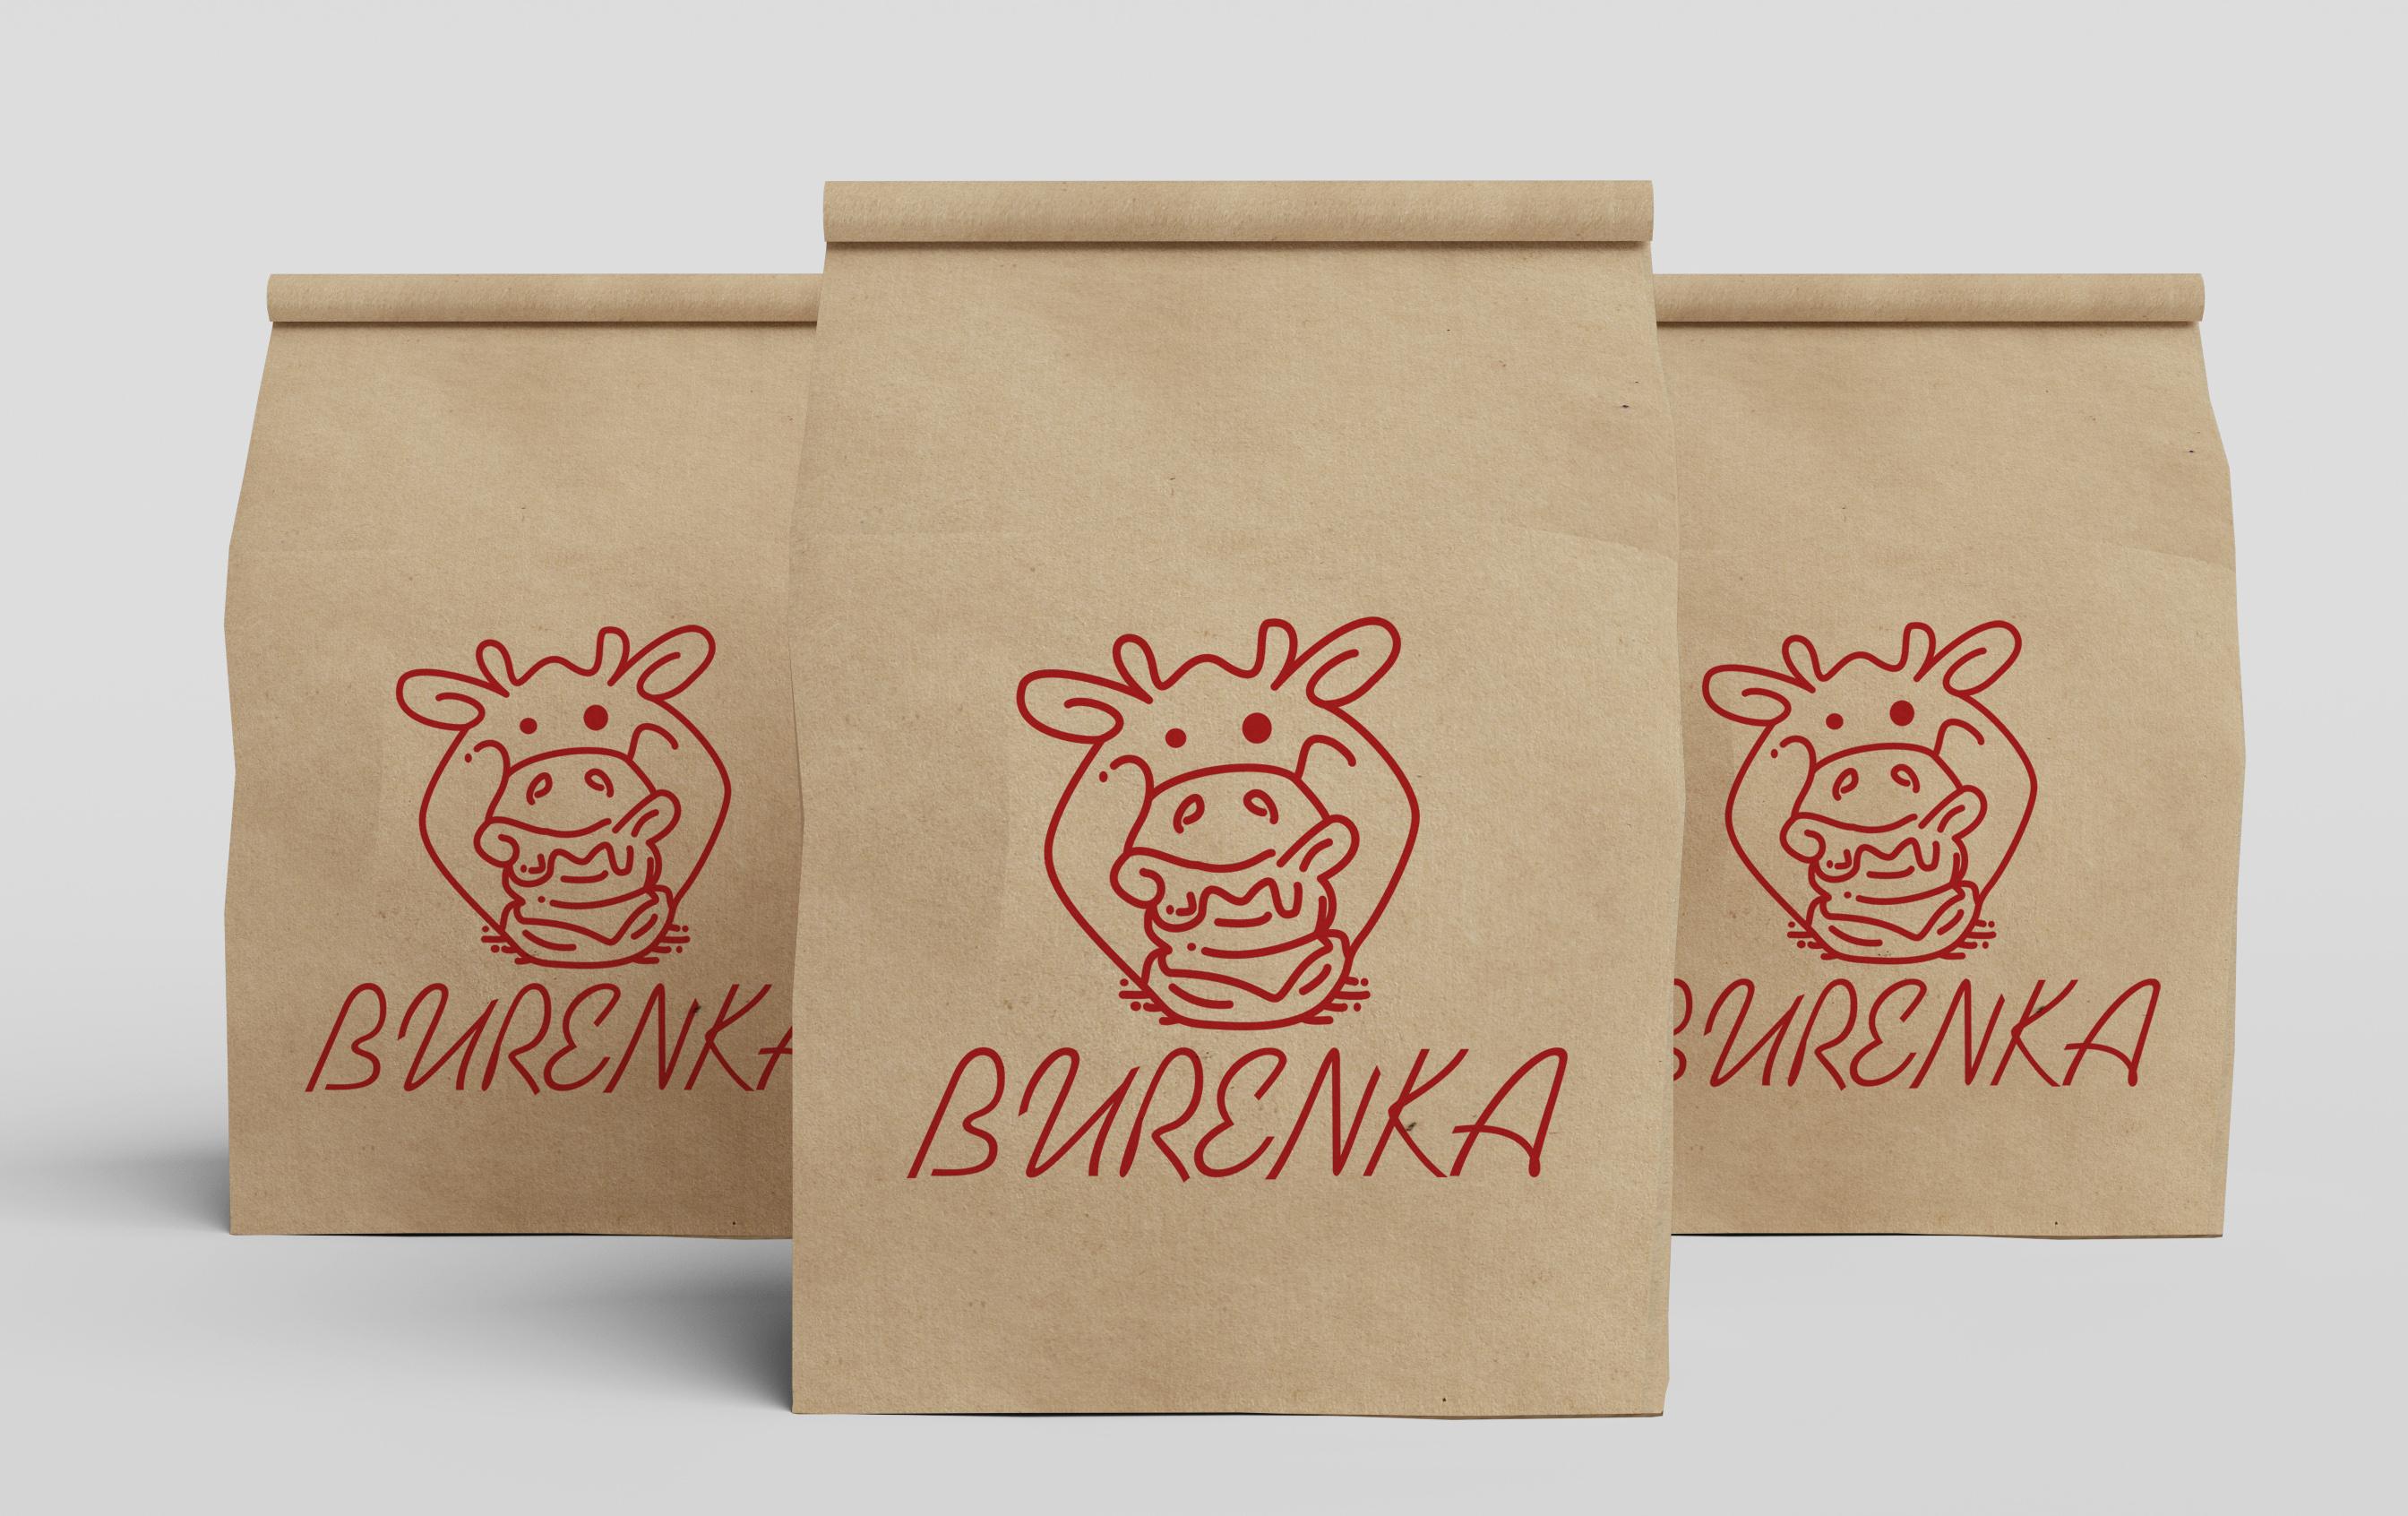 Логотип для Бургерной с Пекарней фото f_0395e155585151ad.jpg